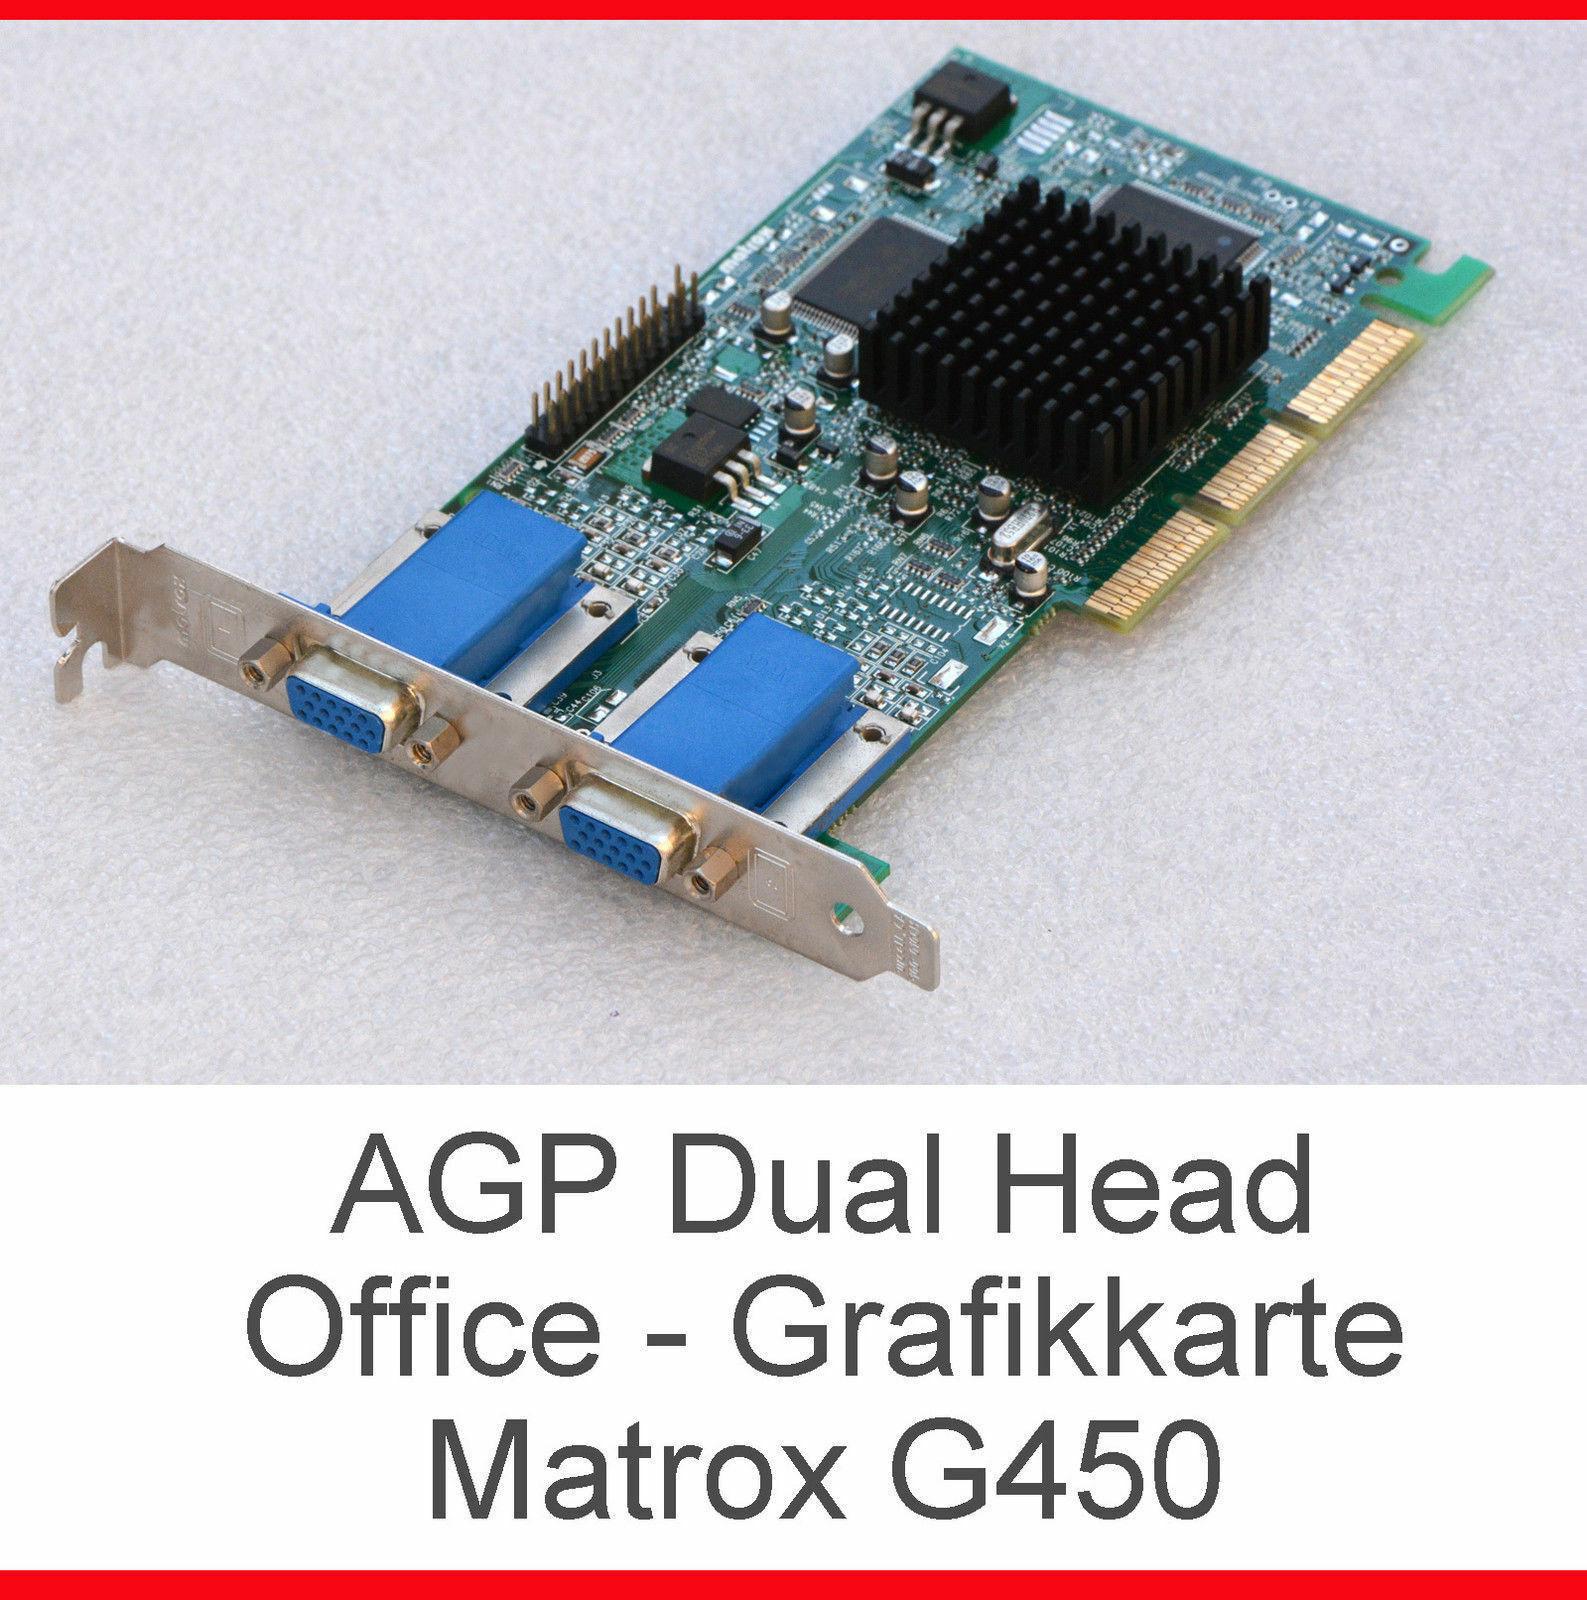 LAUTLOSE DUAL HEAD 3D OFFICE GRAFIKKARTE FÜR 2 MONITORE MATROX G45+ 32MB MGA G20